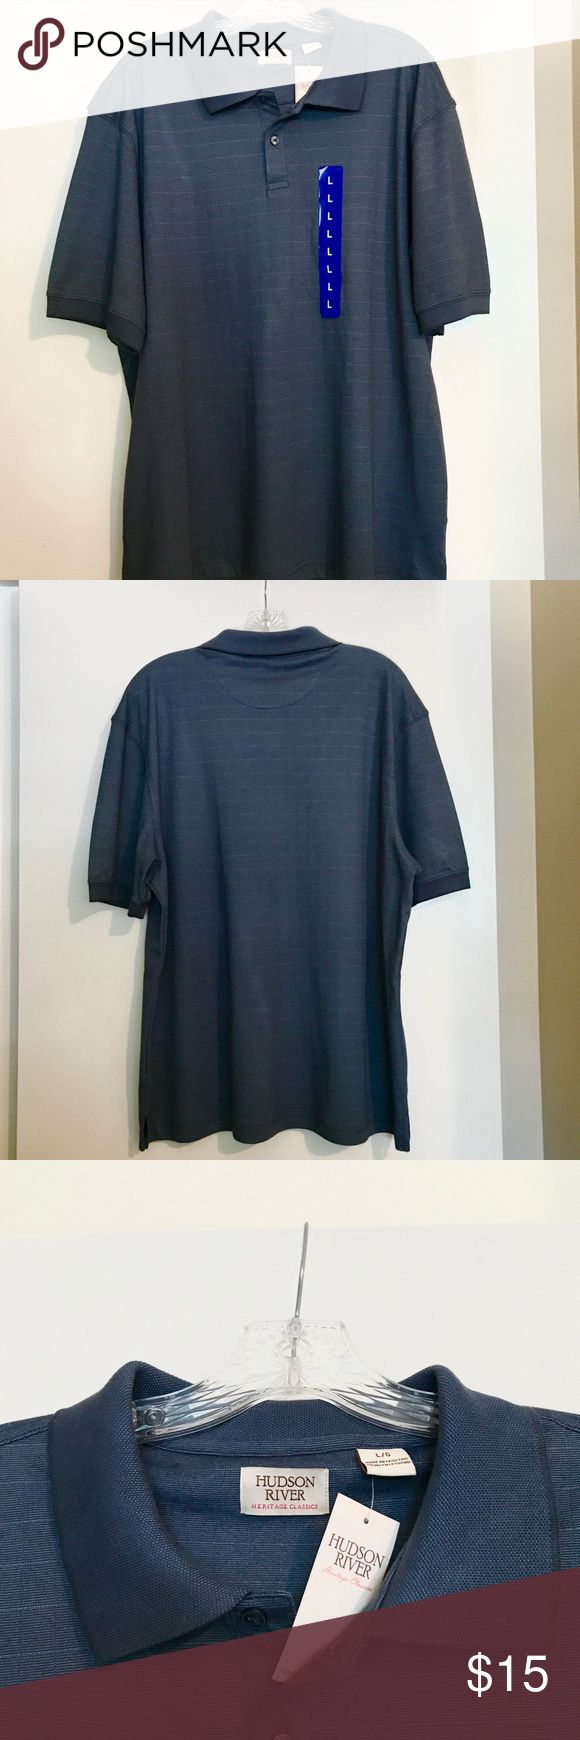 Men's Blue Short Sleeve Polo Tee Hudson River Heritage Classics Men's Short Sleeve Polo Shirt ( Glacier Blue) Hudson River Clothing Co. Shirts Polos